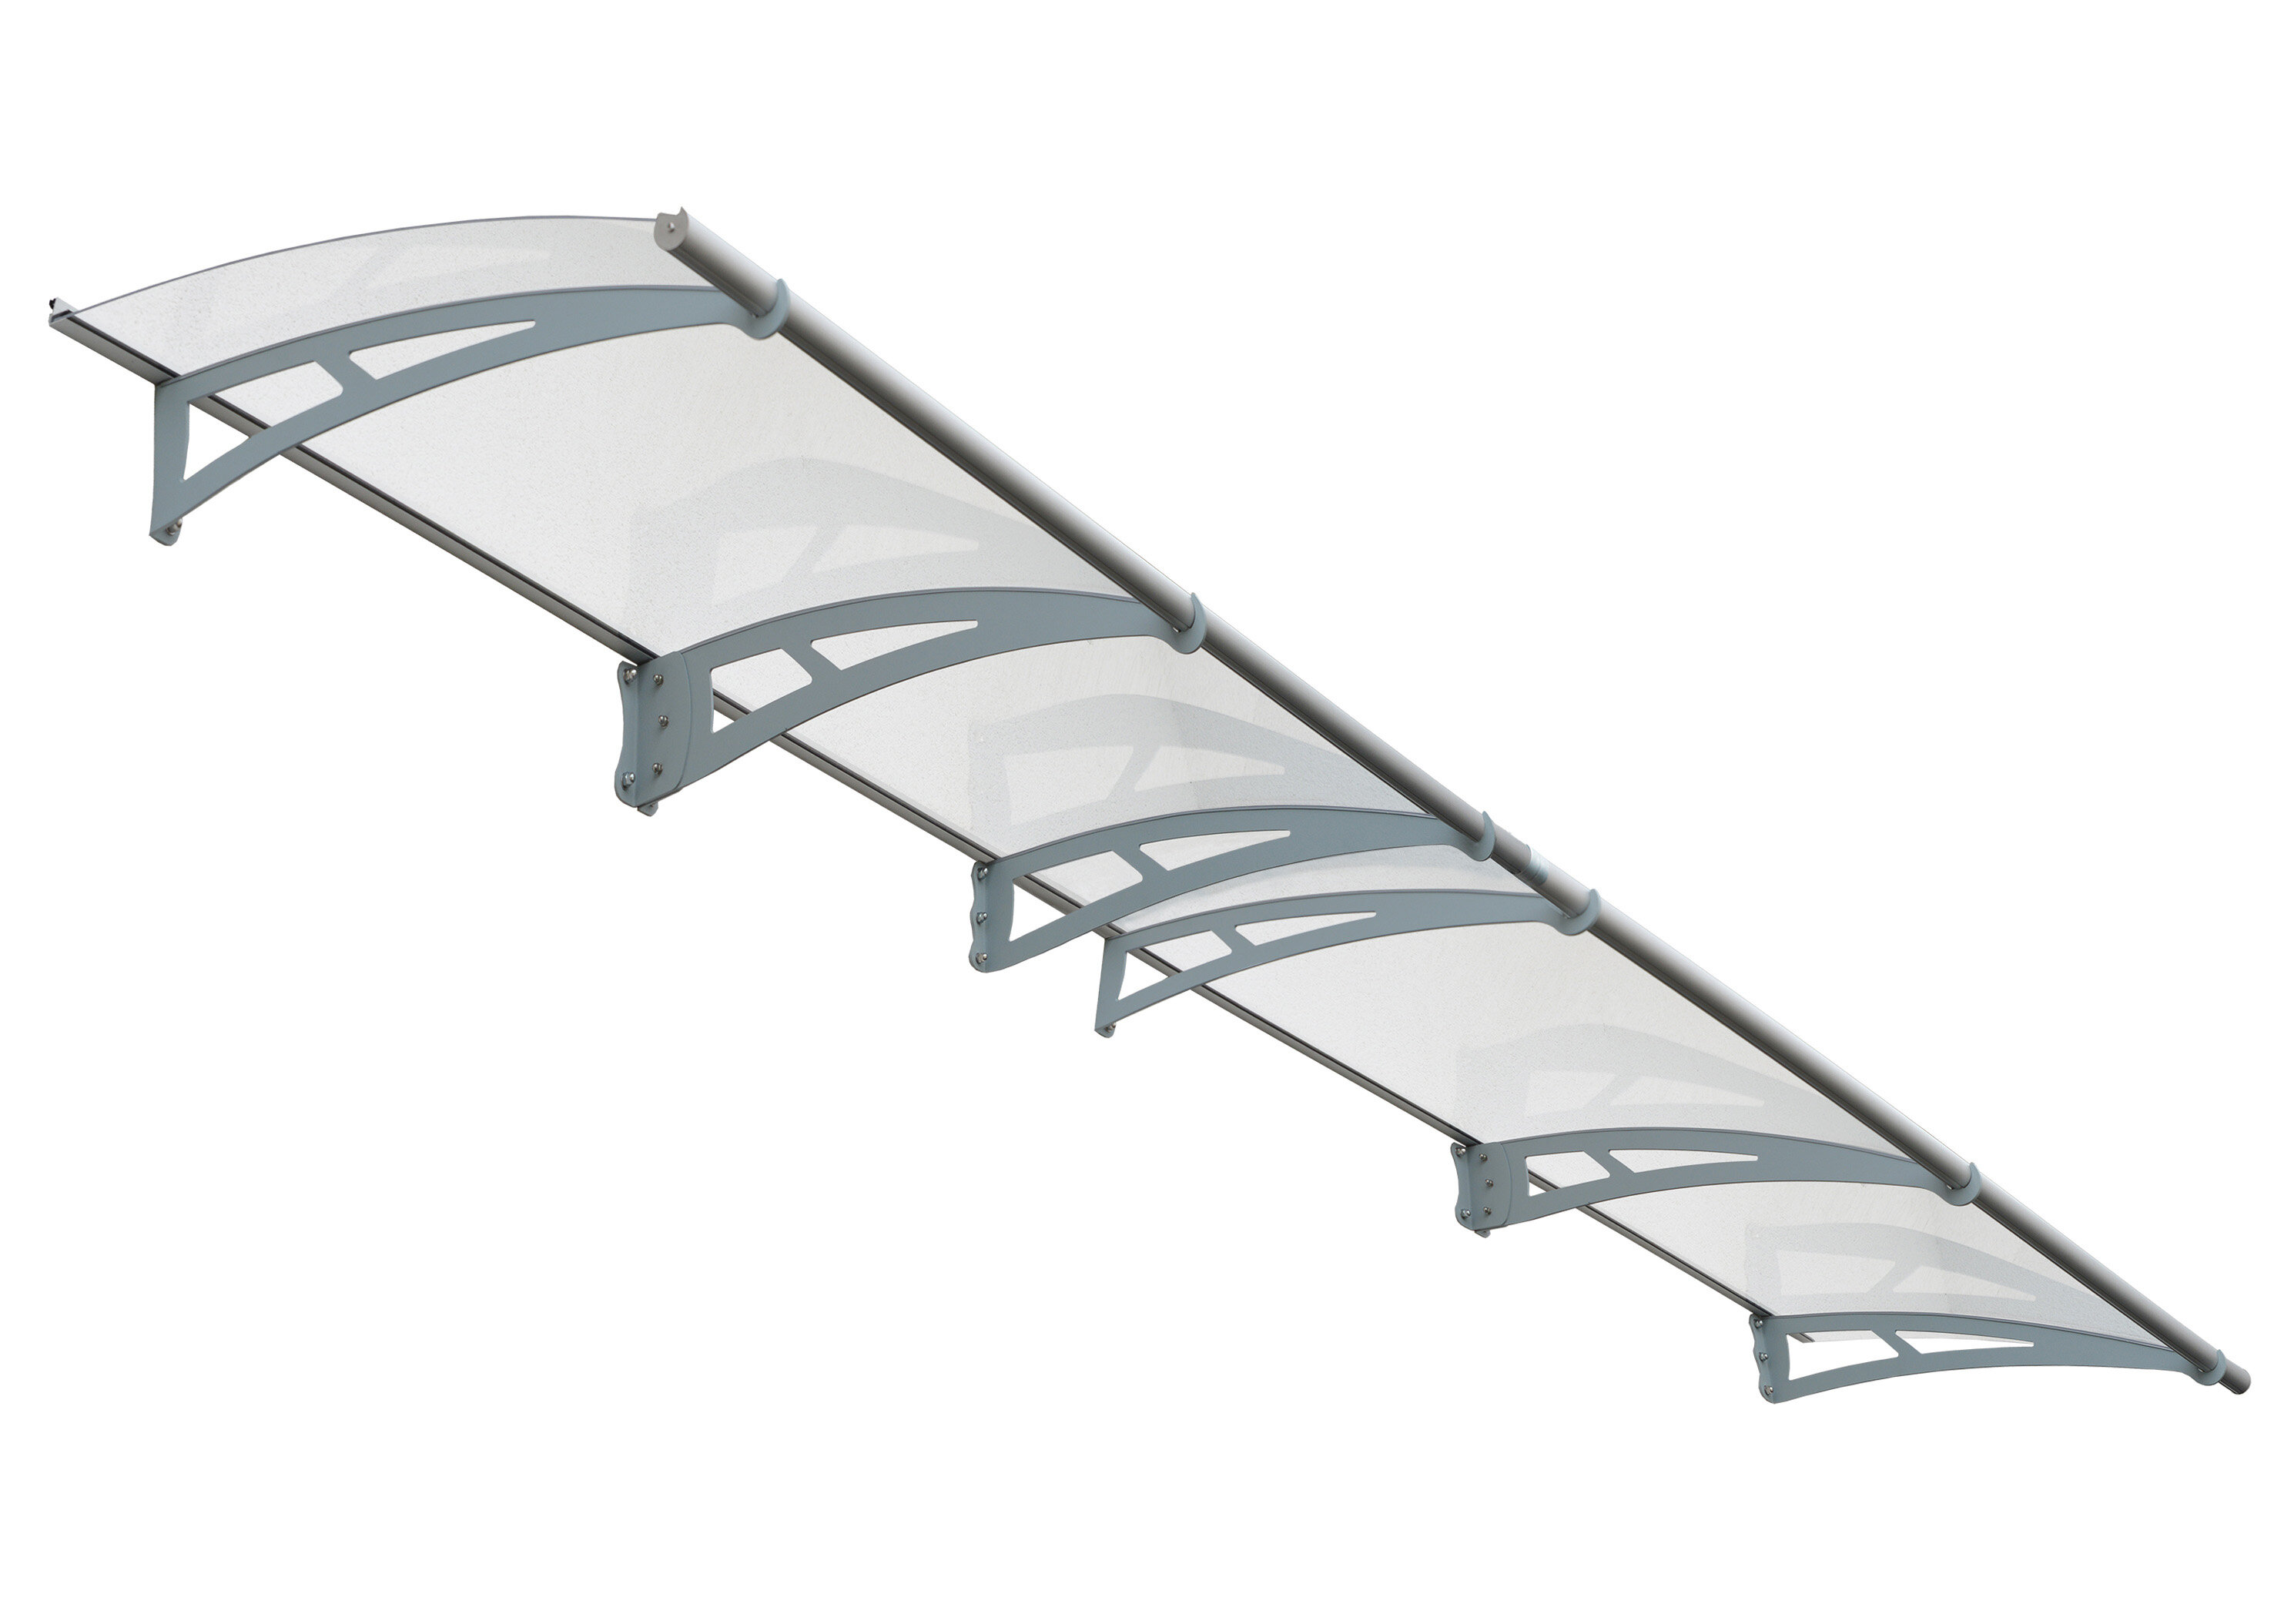 Palram Aquila™ 4100 13.5 ft. W x 3 ft. D Door Awning | Wayfair